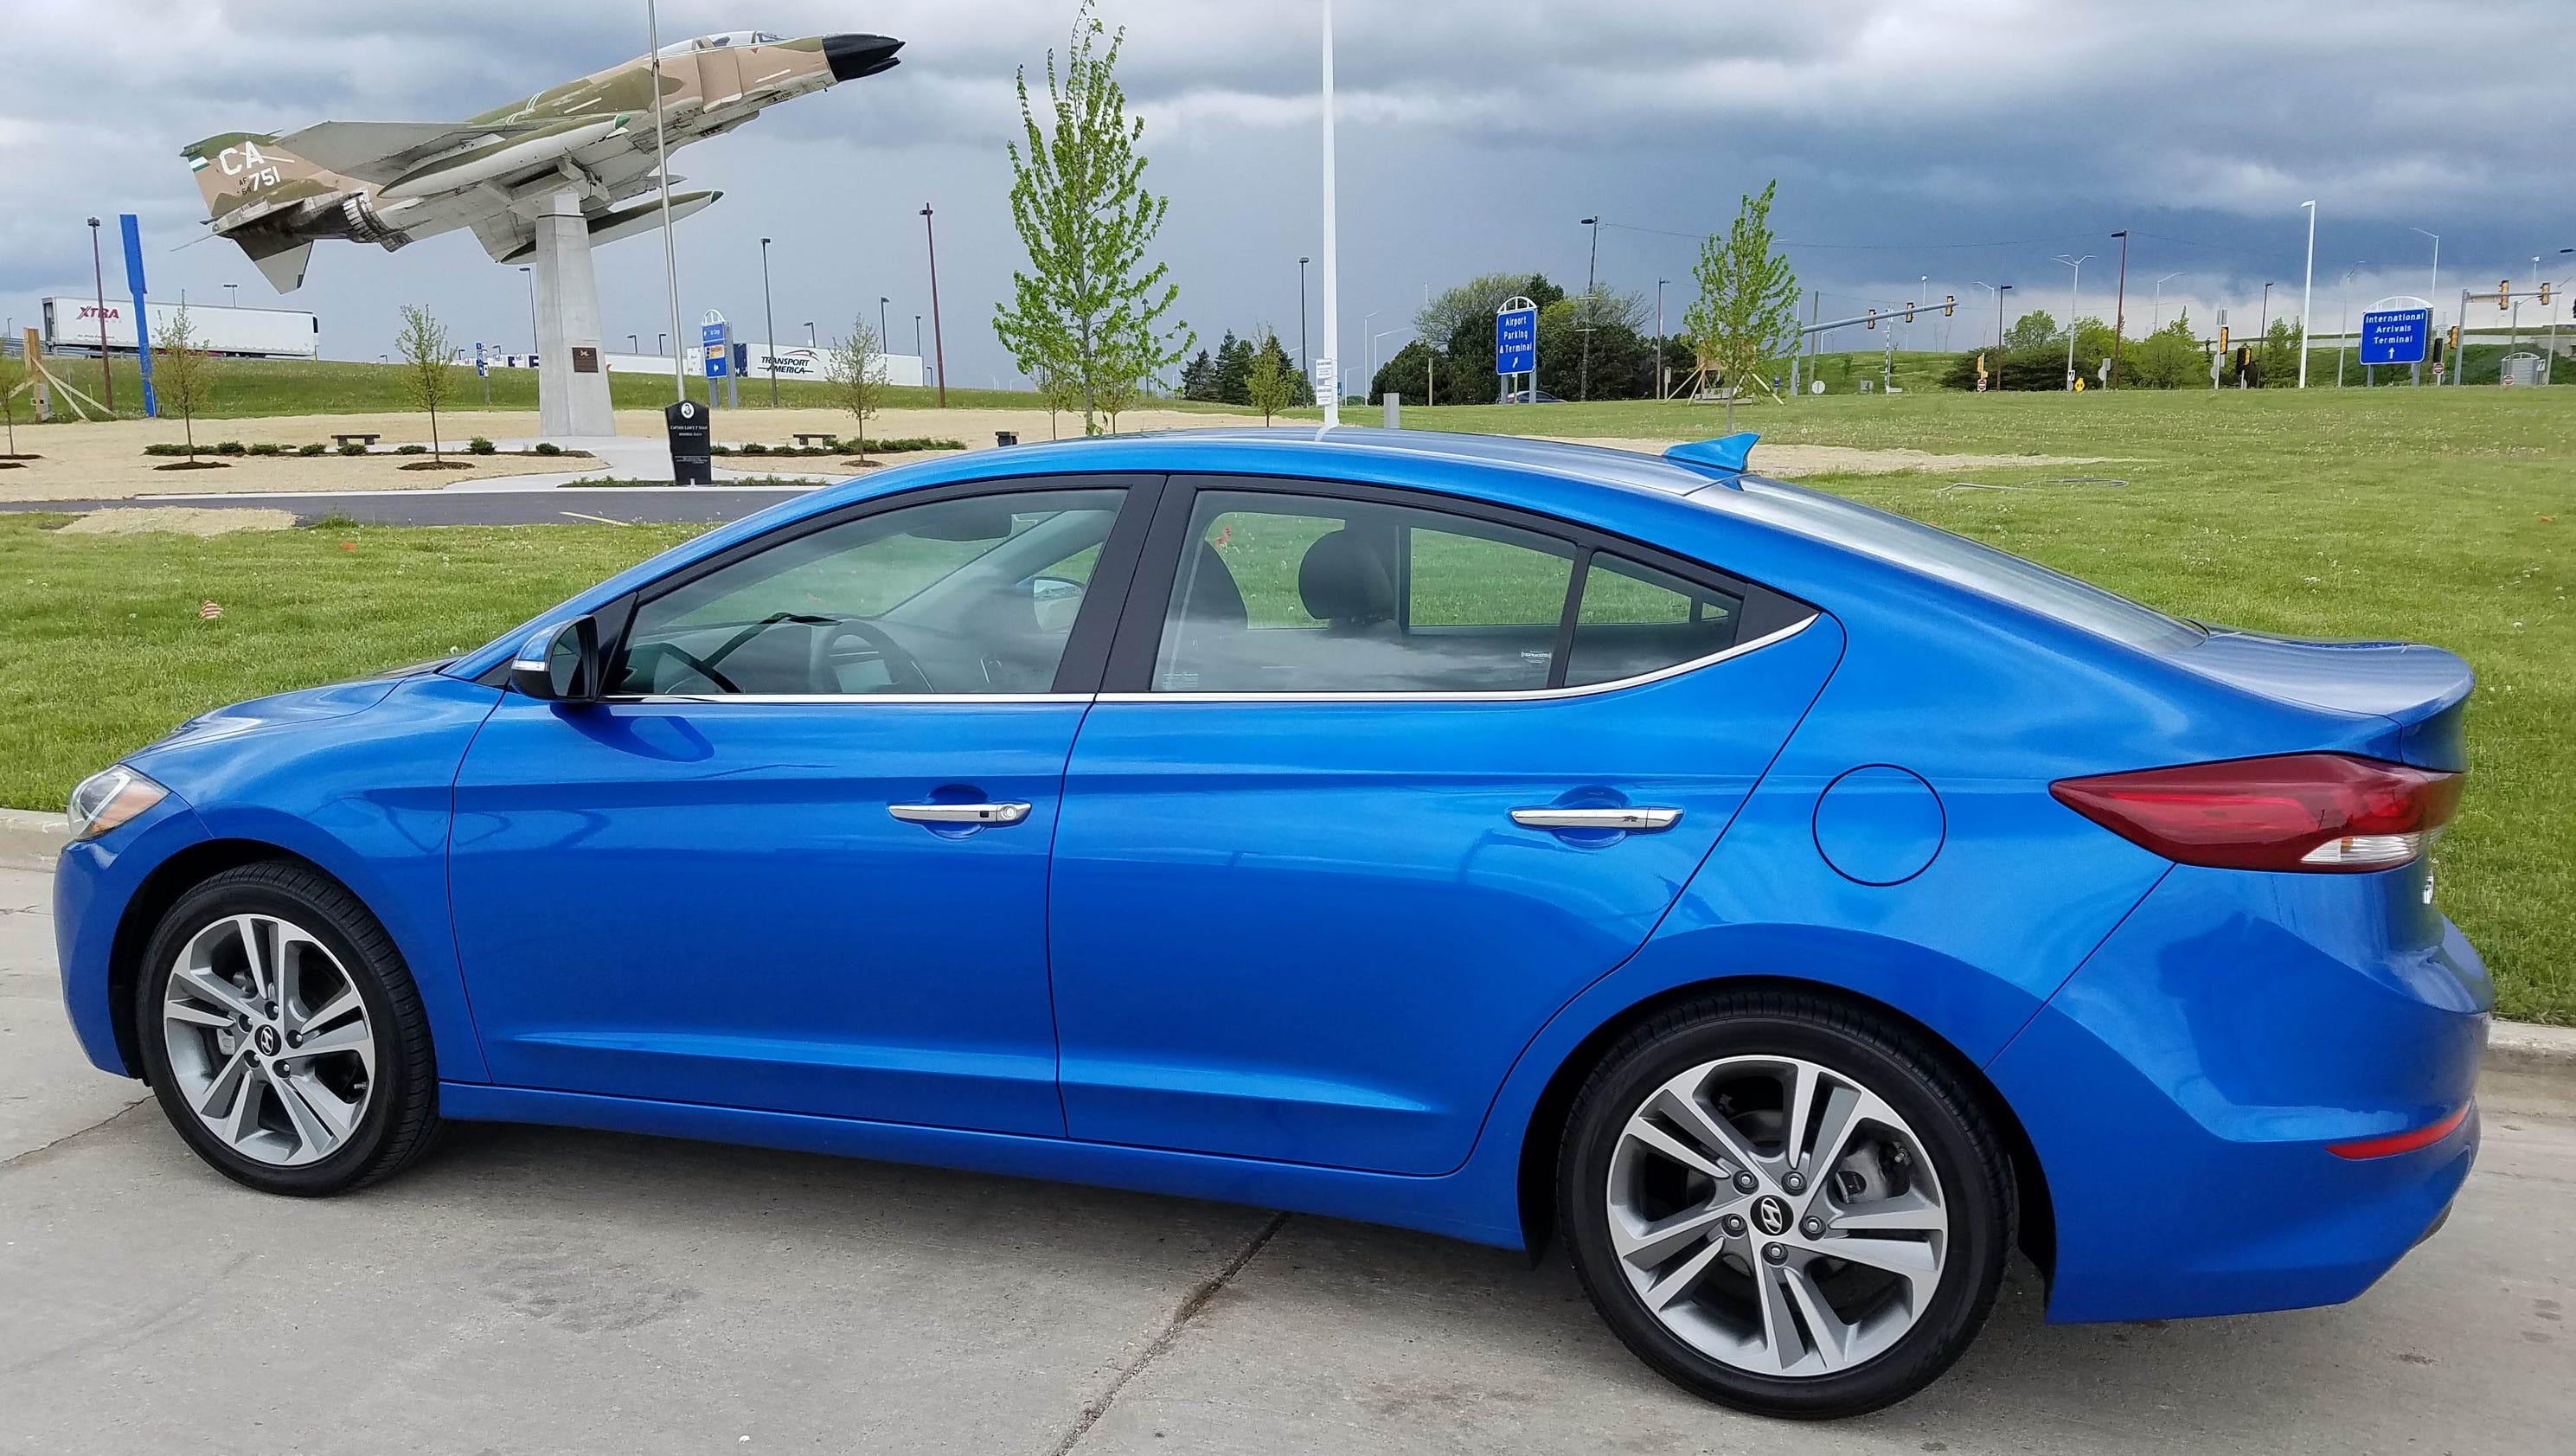 Savage on Wheels 2017 Hyundai Elantra Limited milder but still an